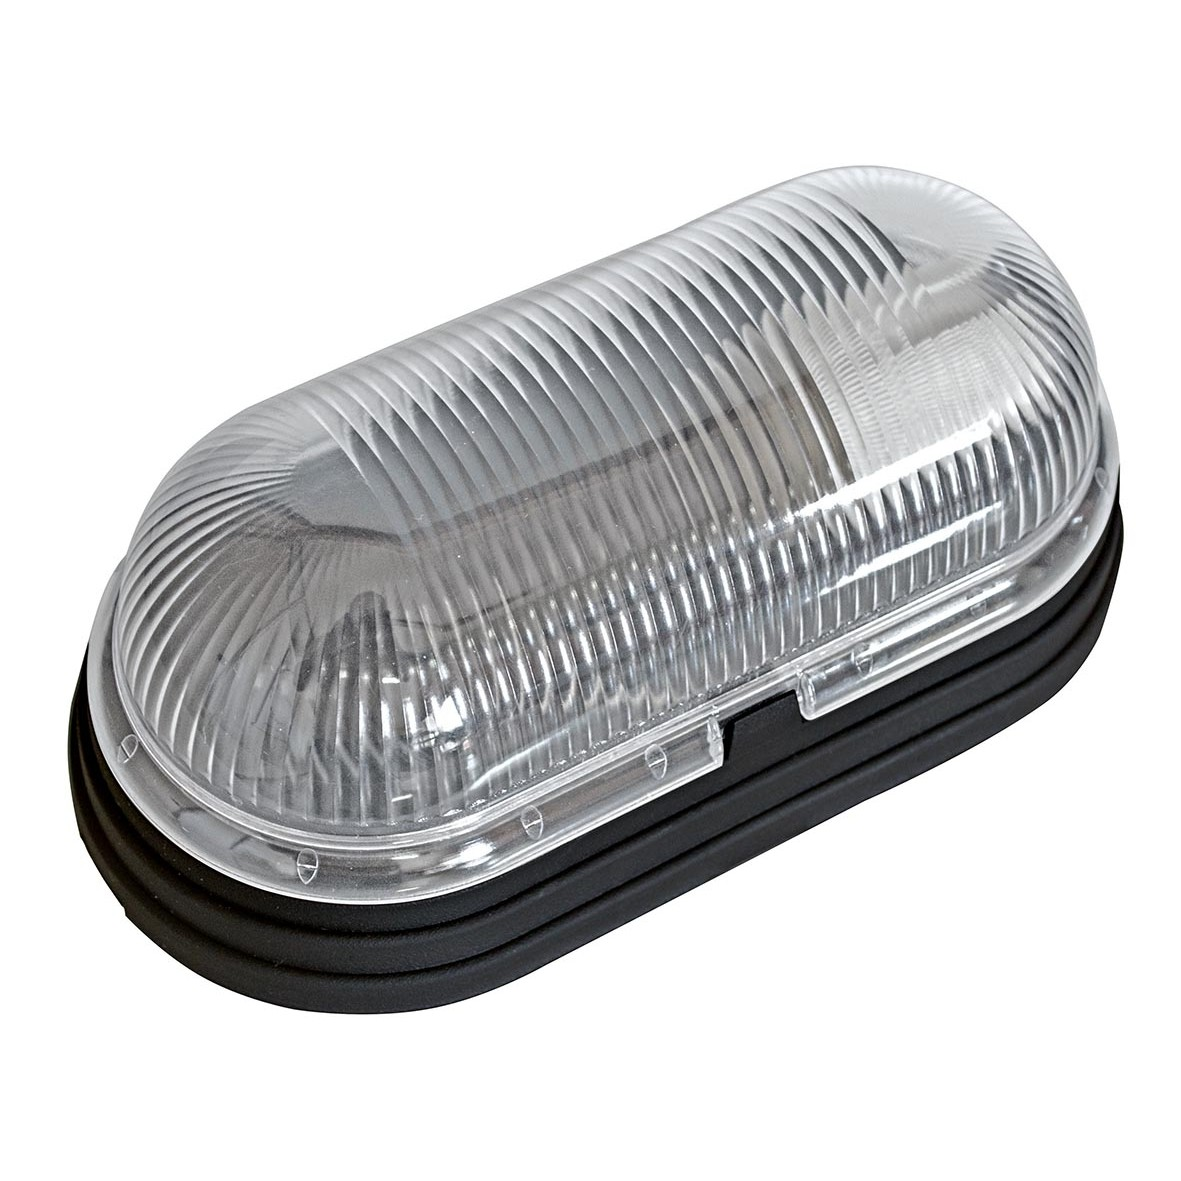 Luminaria Oval Plastica Tartaruga Preta Bivolt - Dital